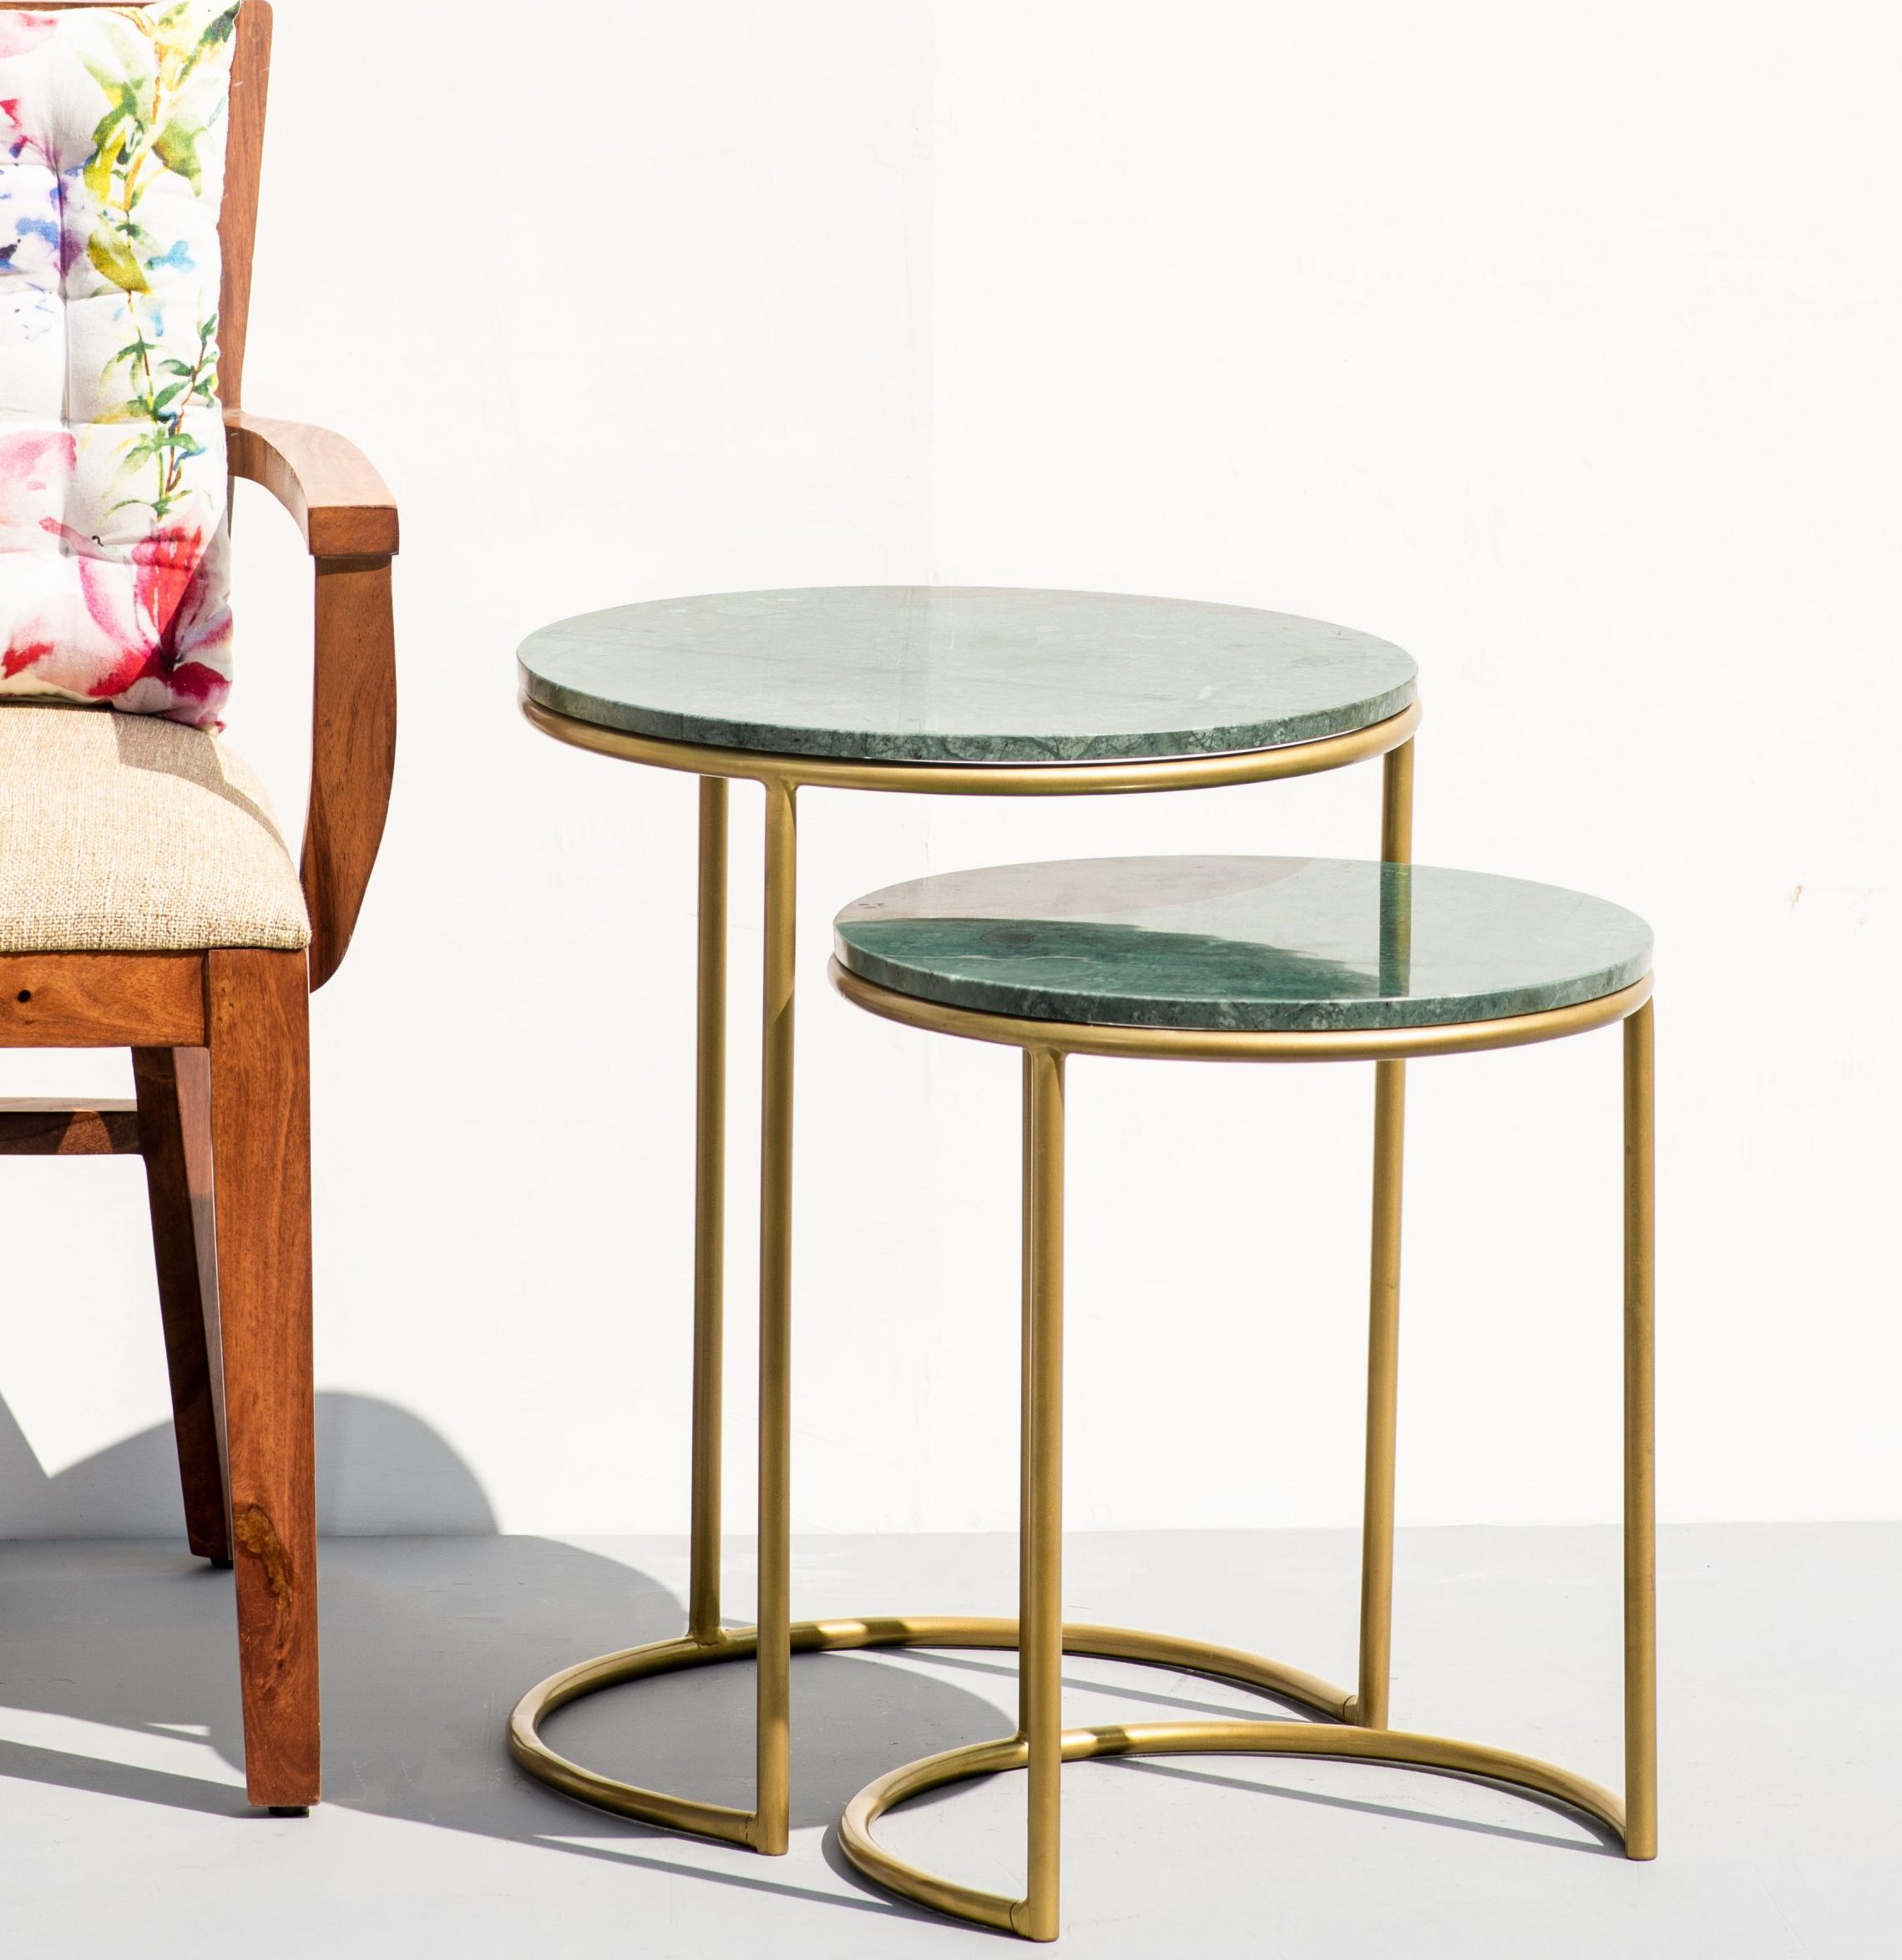 Nykaa Home- The Decor Remedy jade green table